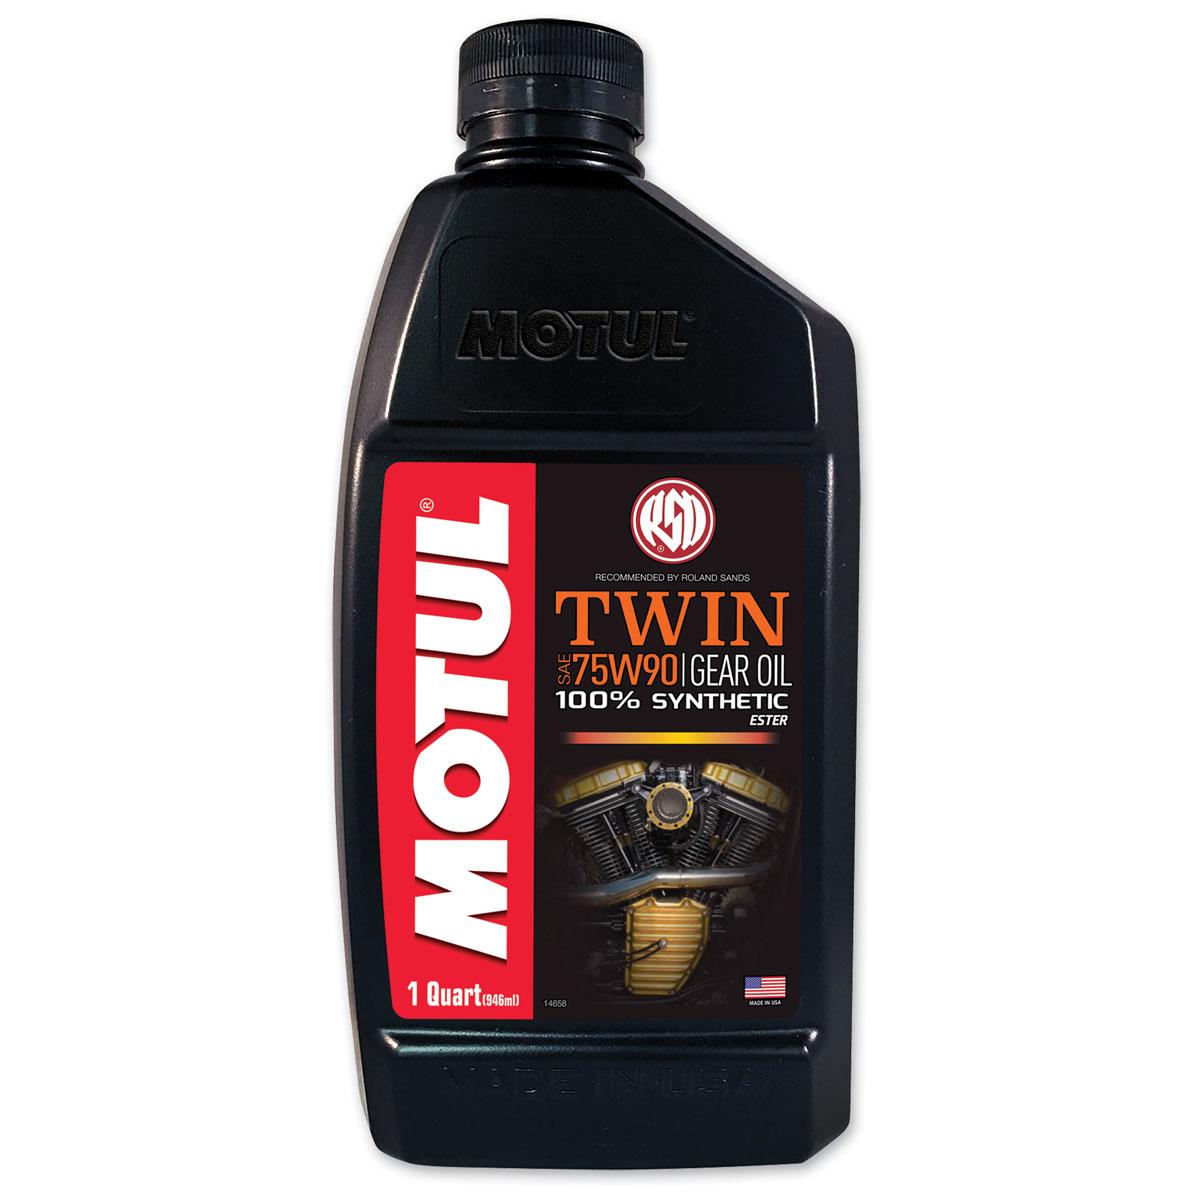 MOTUL RSD 75W90 Synthetic Transmission Gear Oil Quart